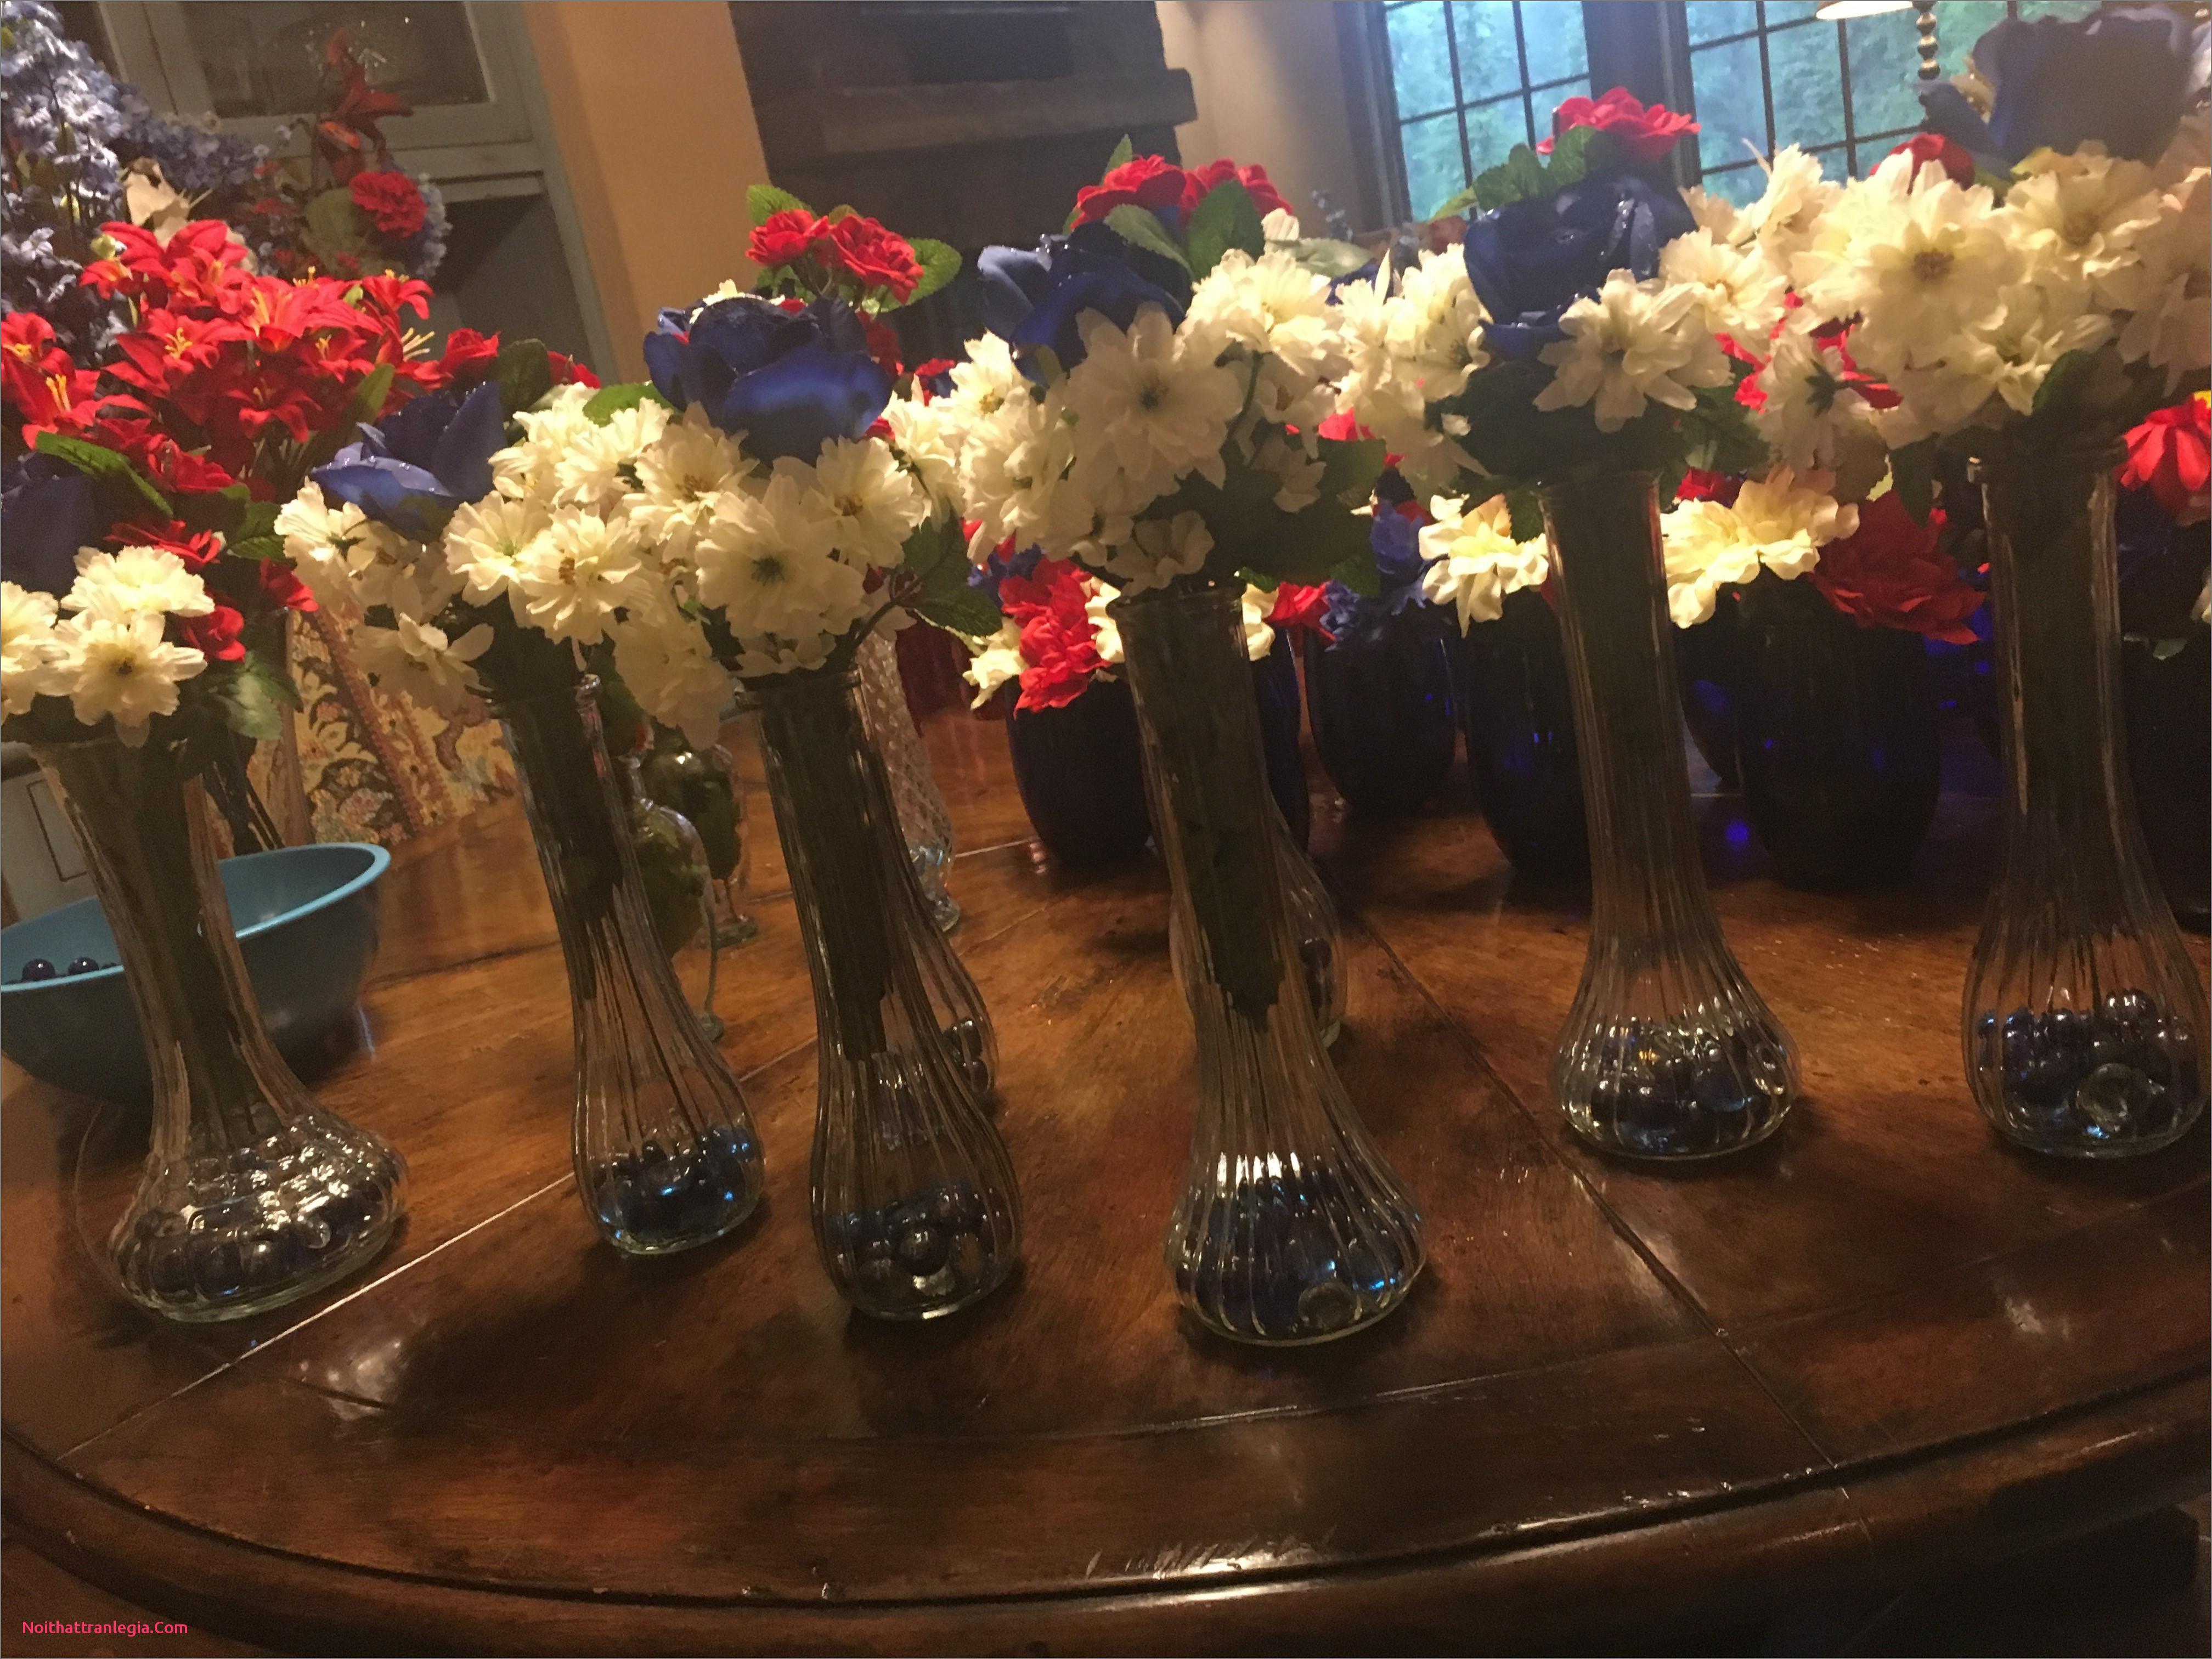 blue and white vases cheap of 20 wedding vases noithattranlegia vases design throughout decoration line luxury dollar tree wedding decorations awesome h vases dollar vase i 0d